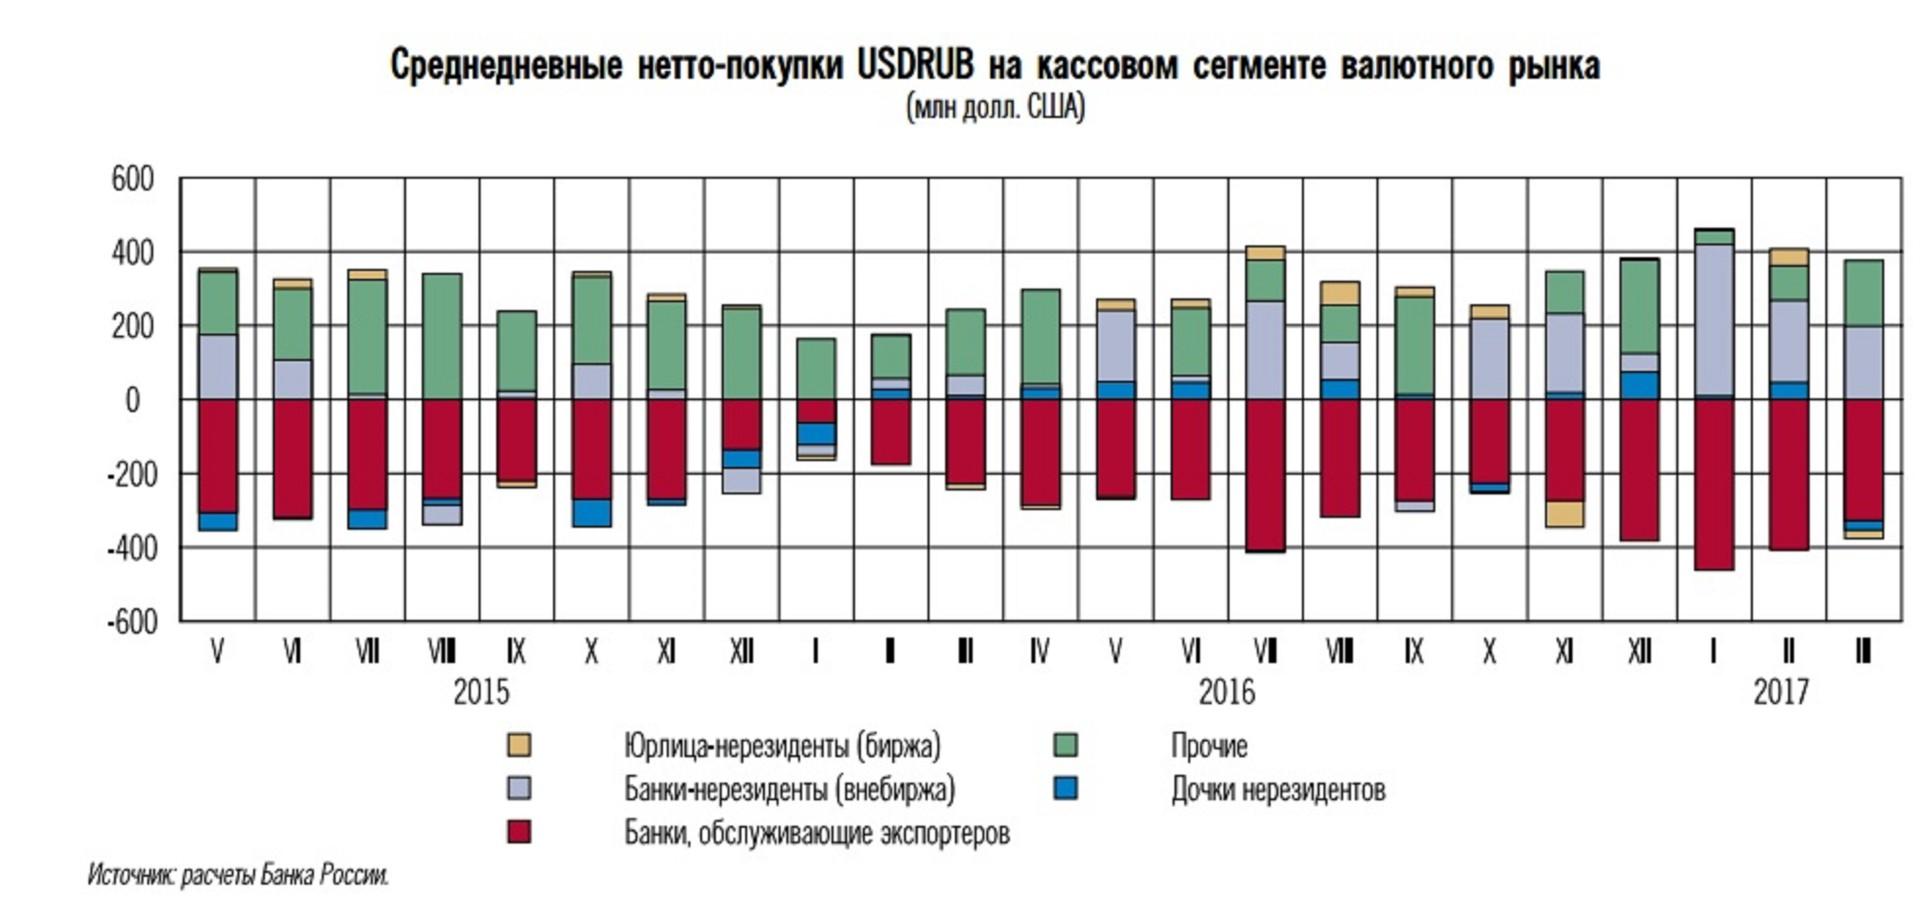 ЦБ заявил о слабом влиянии нерезидентов на рубль